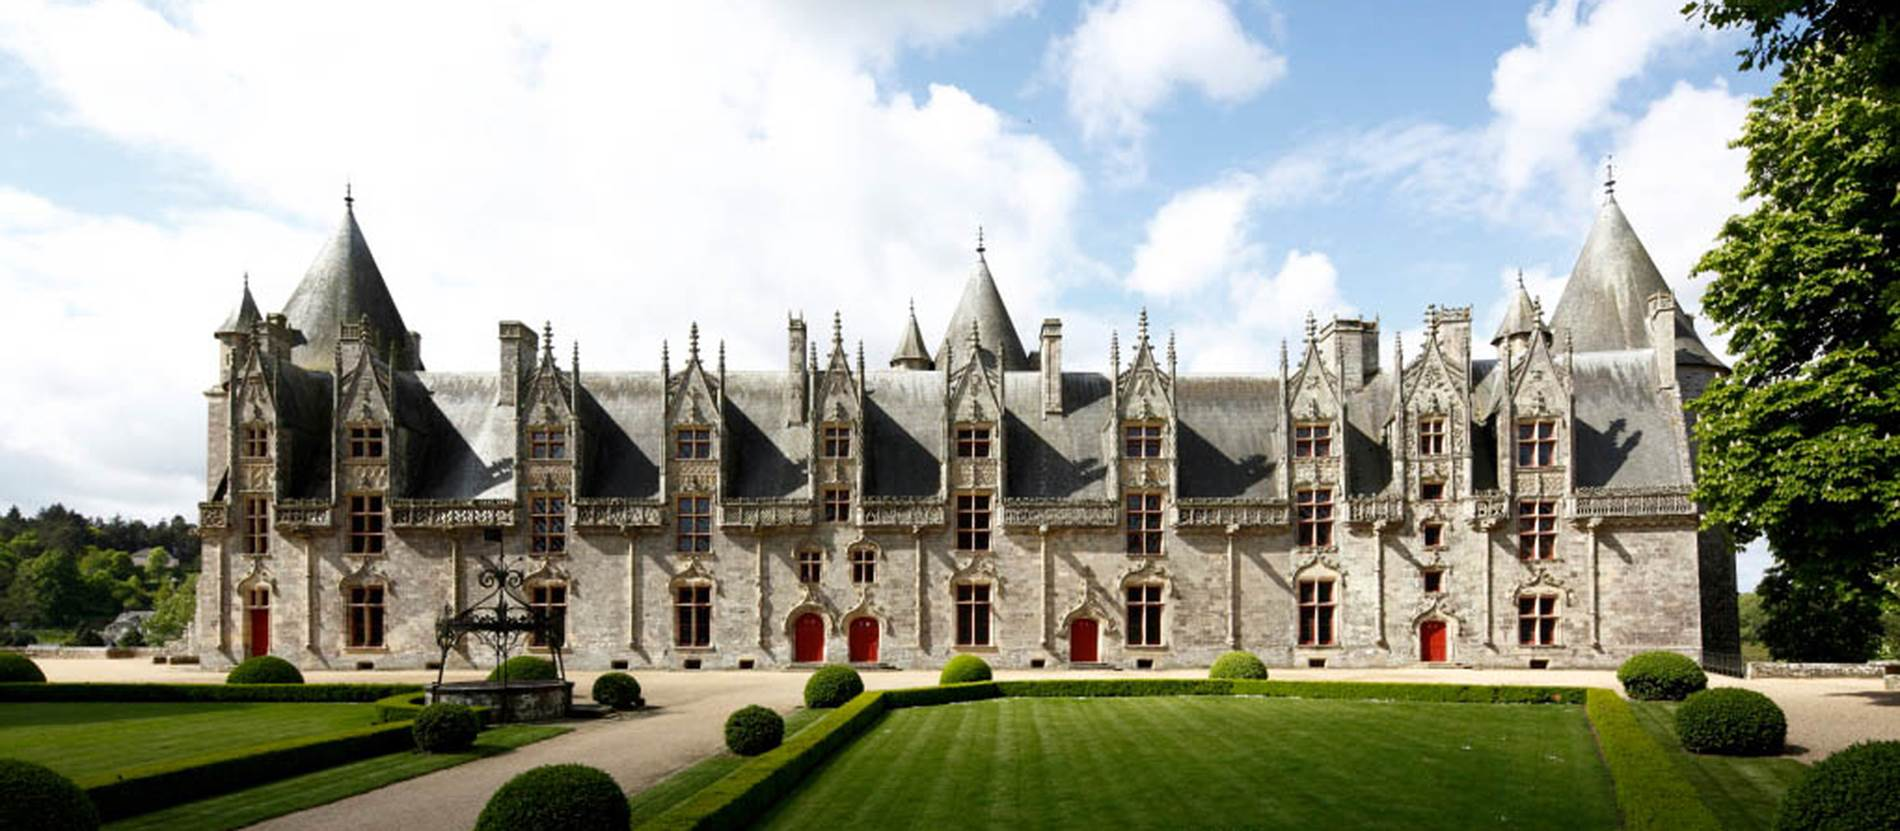 Château-et-parc-de-Josselin-Morbihan-Bretagne-Sud © ©D-Bordes